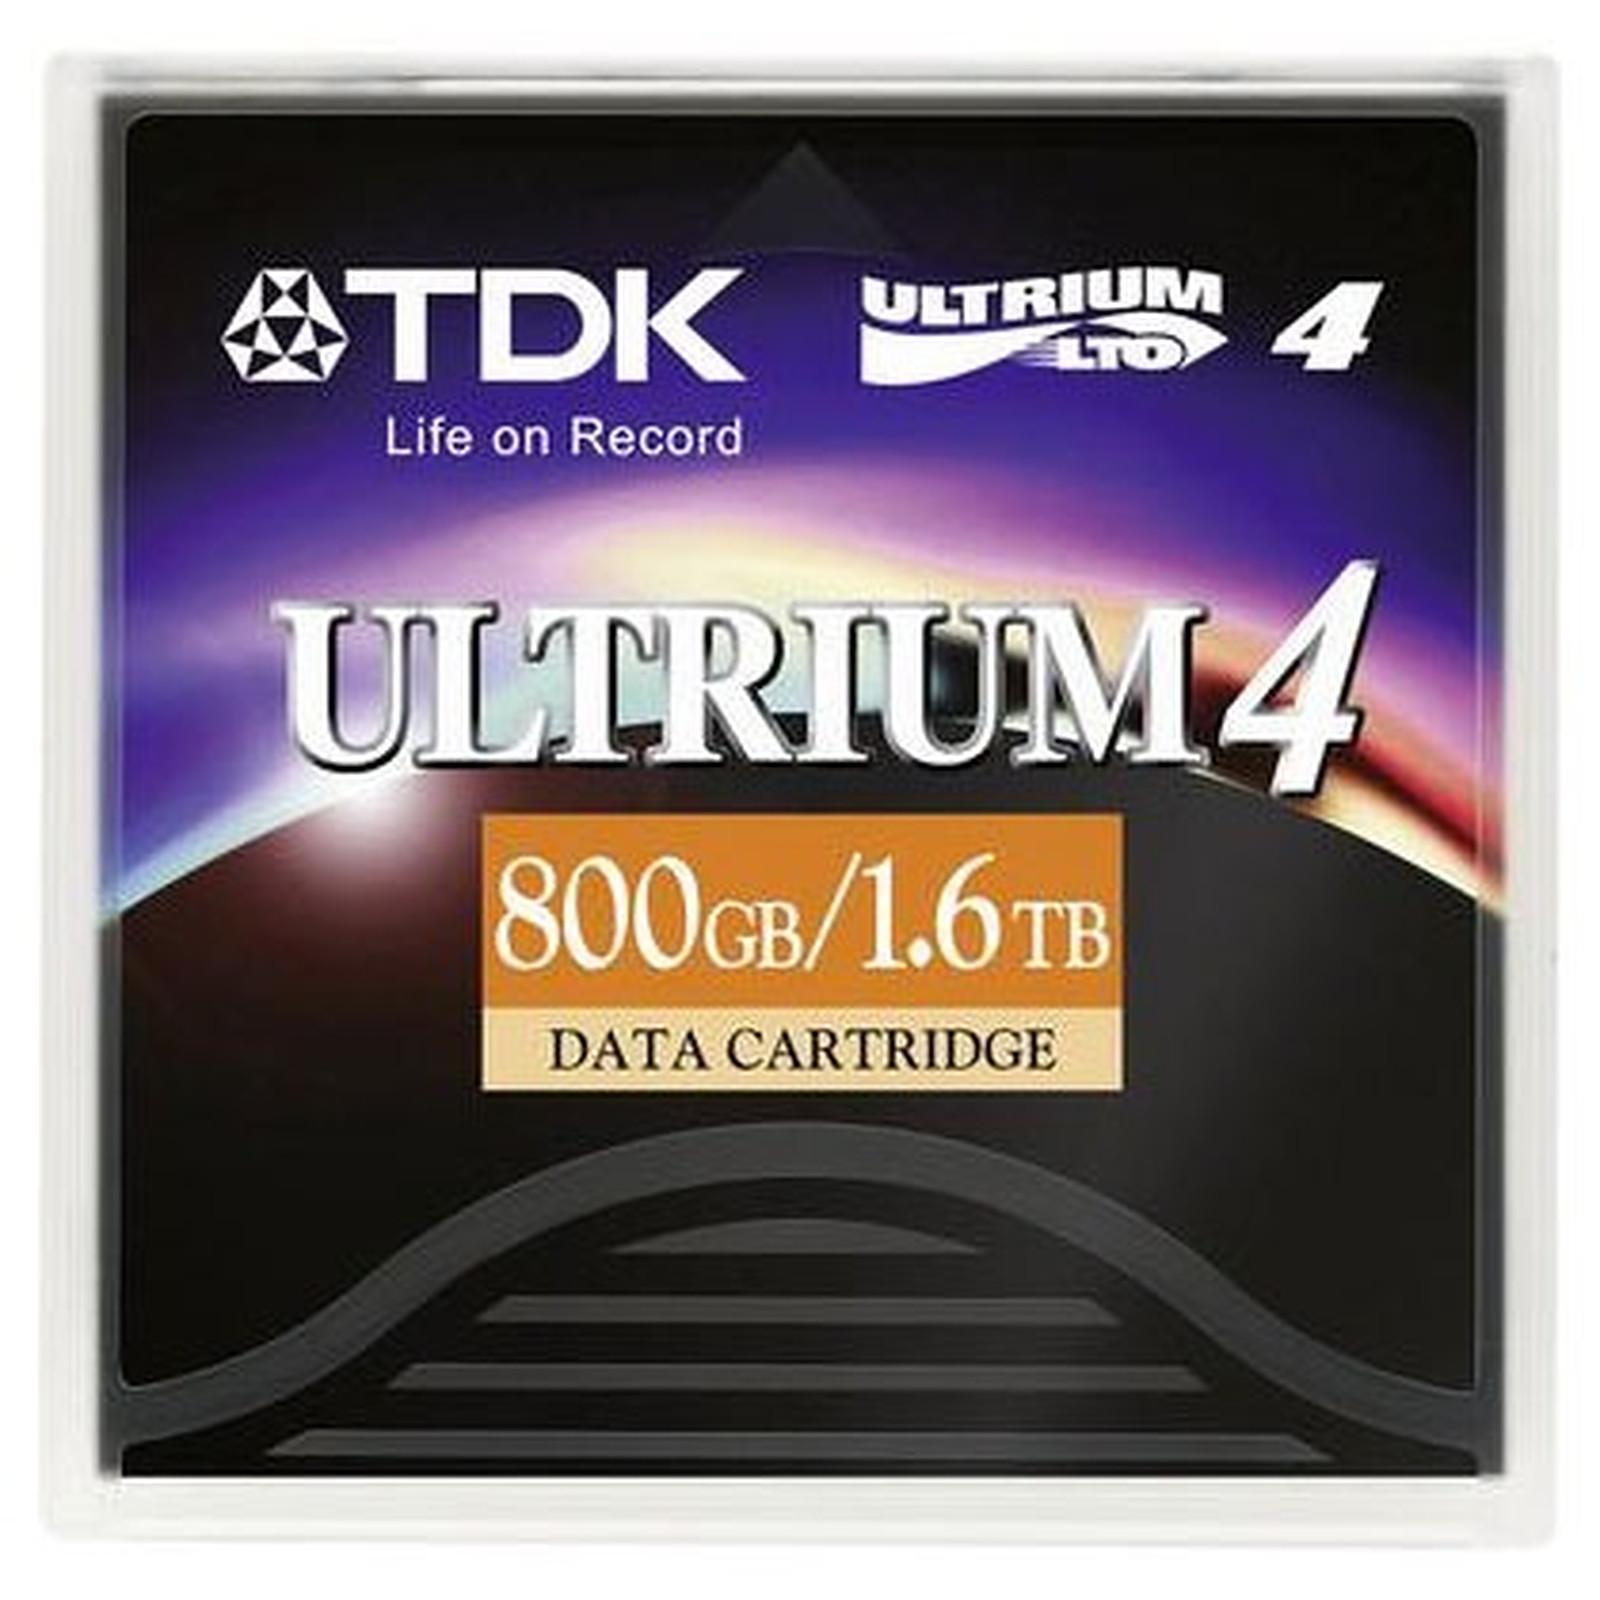 TDK D2407-LTO4 Ultrium 1.6 To